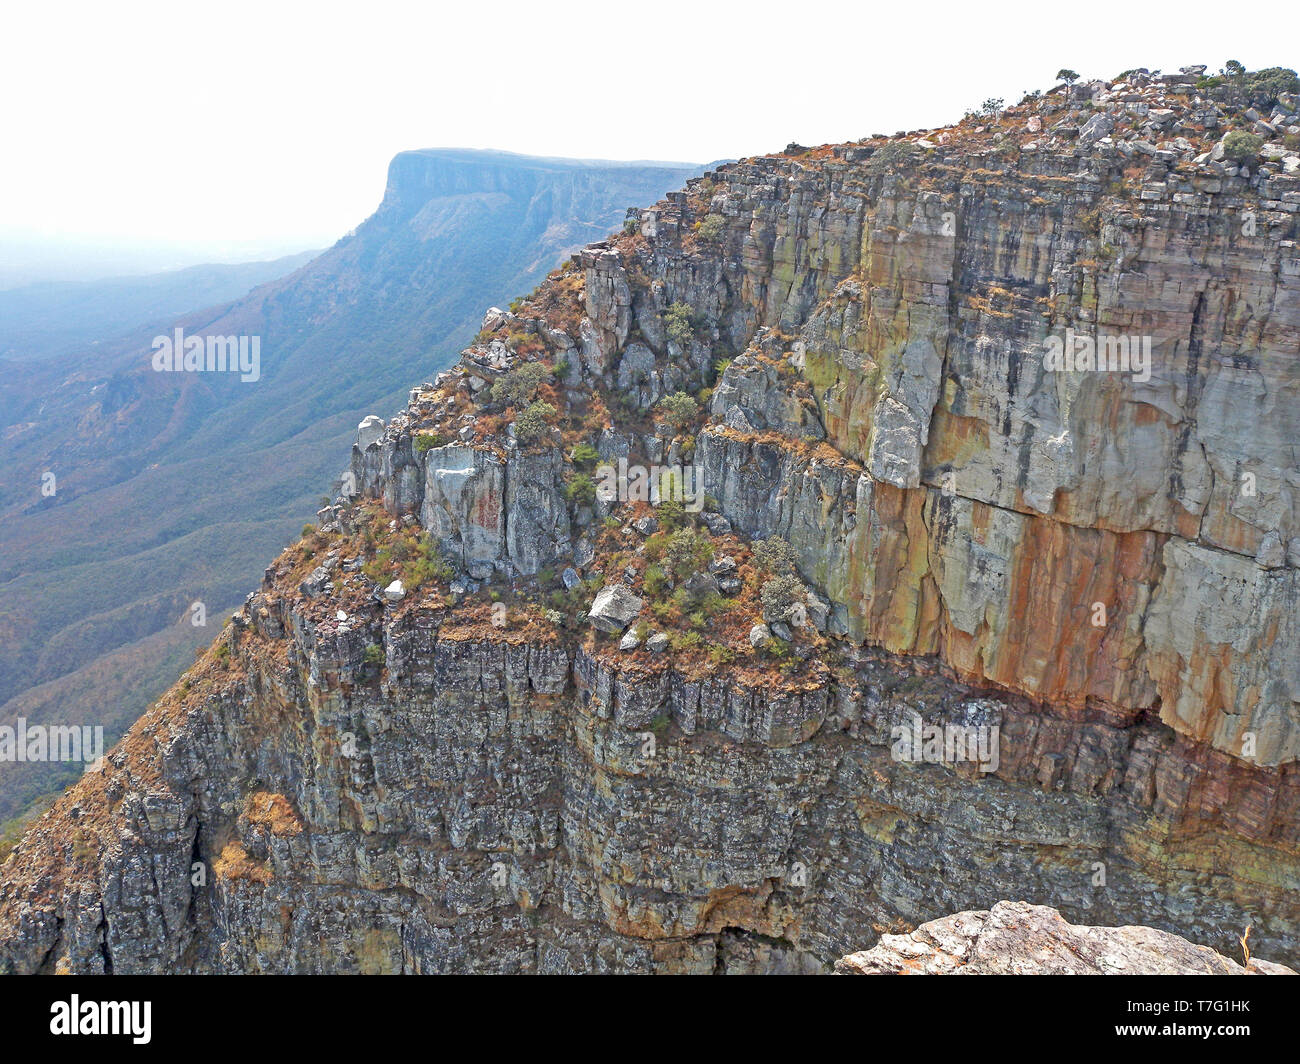 View from the Tundavala Gap on the Tundavala Escarpment near the city of Lubango, in Huíla province, Angola. - Stock Image